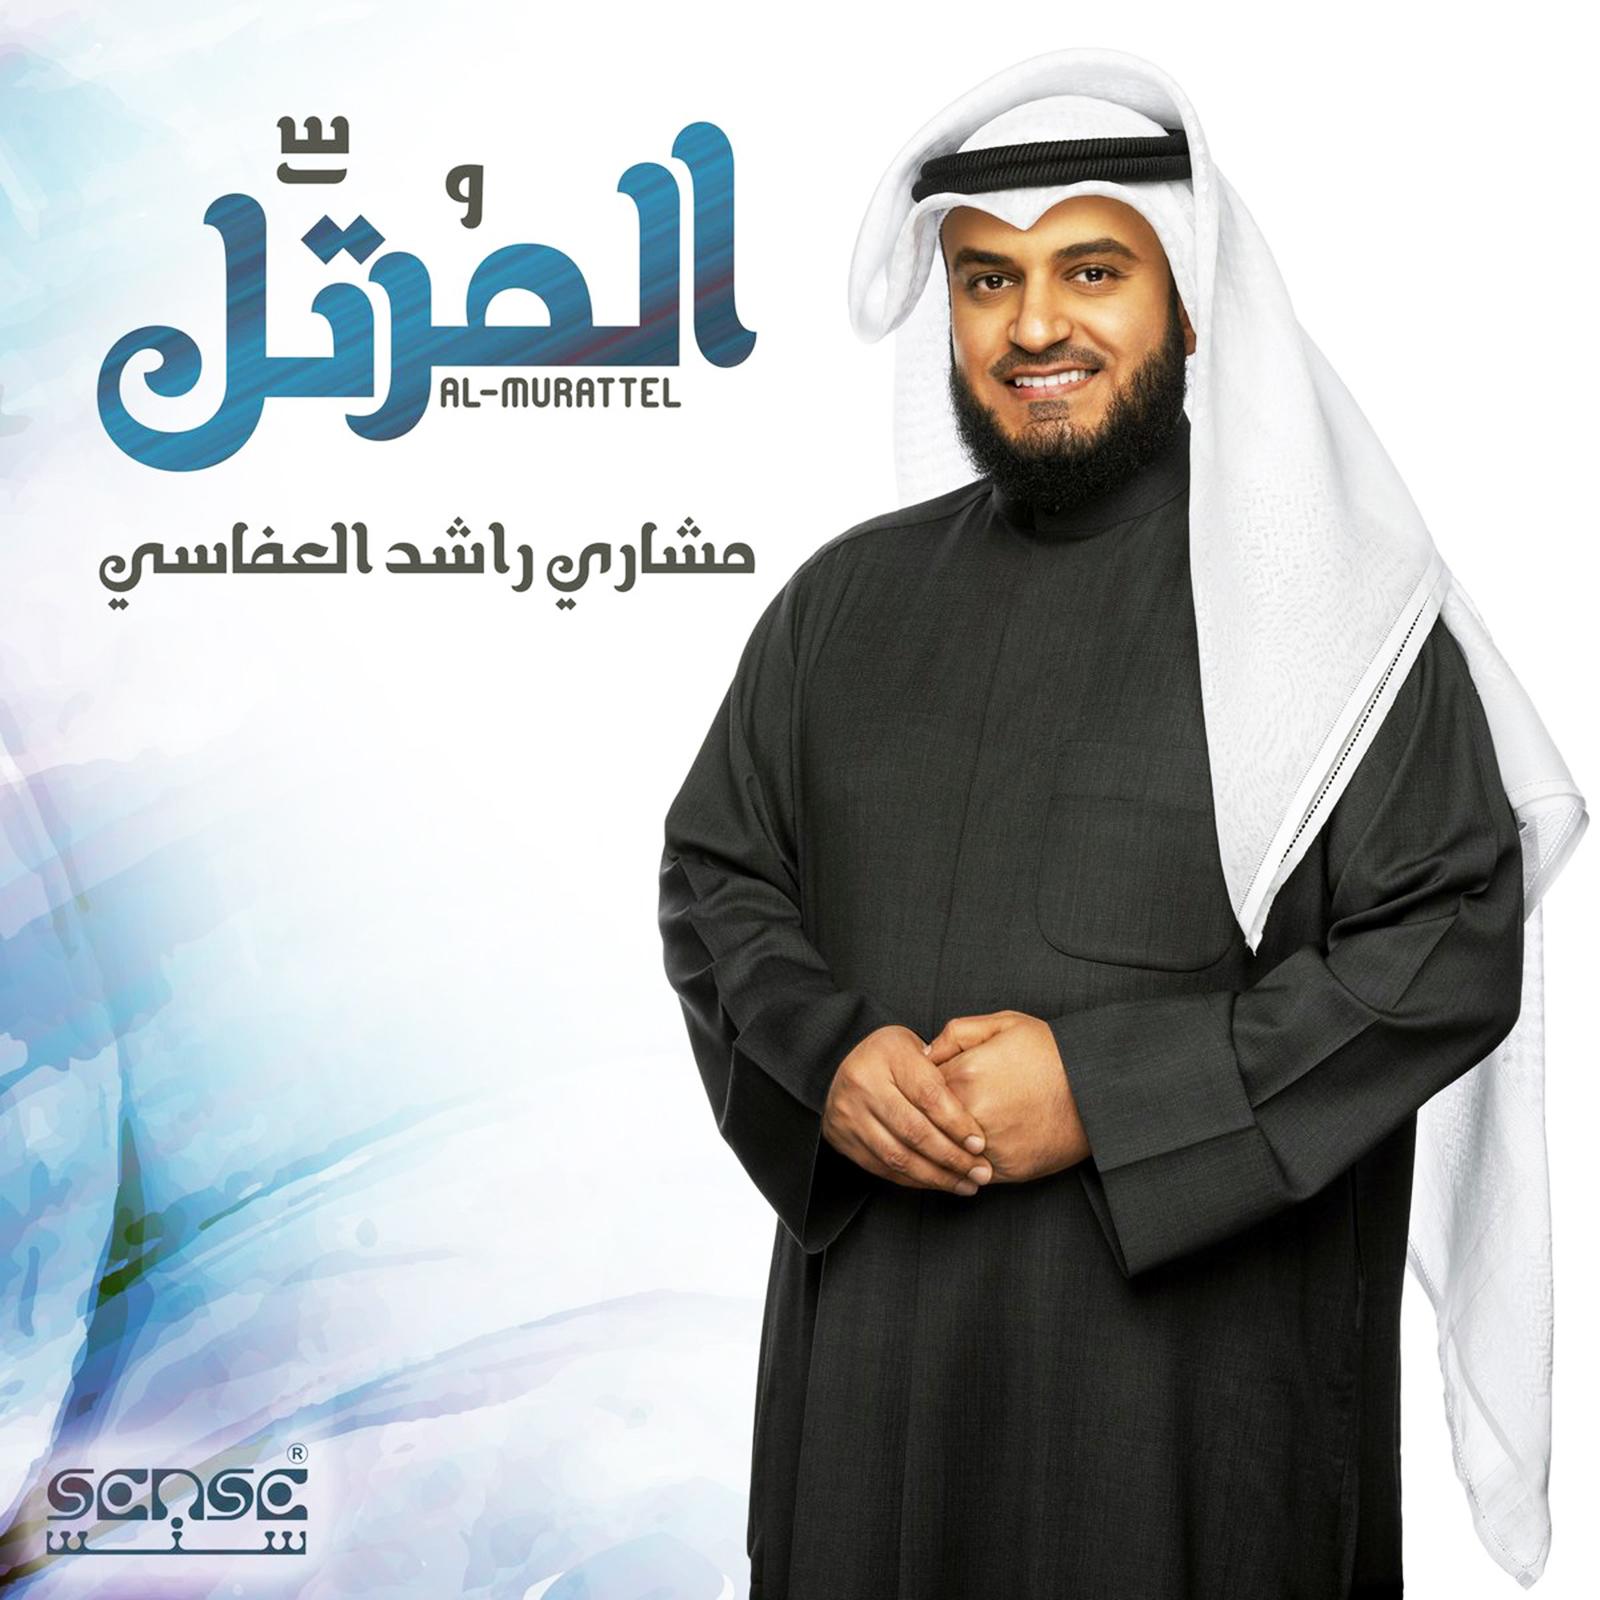 Dowloat Mp3 Meraih Bintang Versi Arab: Nasyid Arab Terlengkap Sheikh Mishary Rashid Al Afasy [2